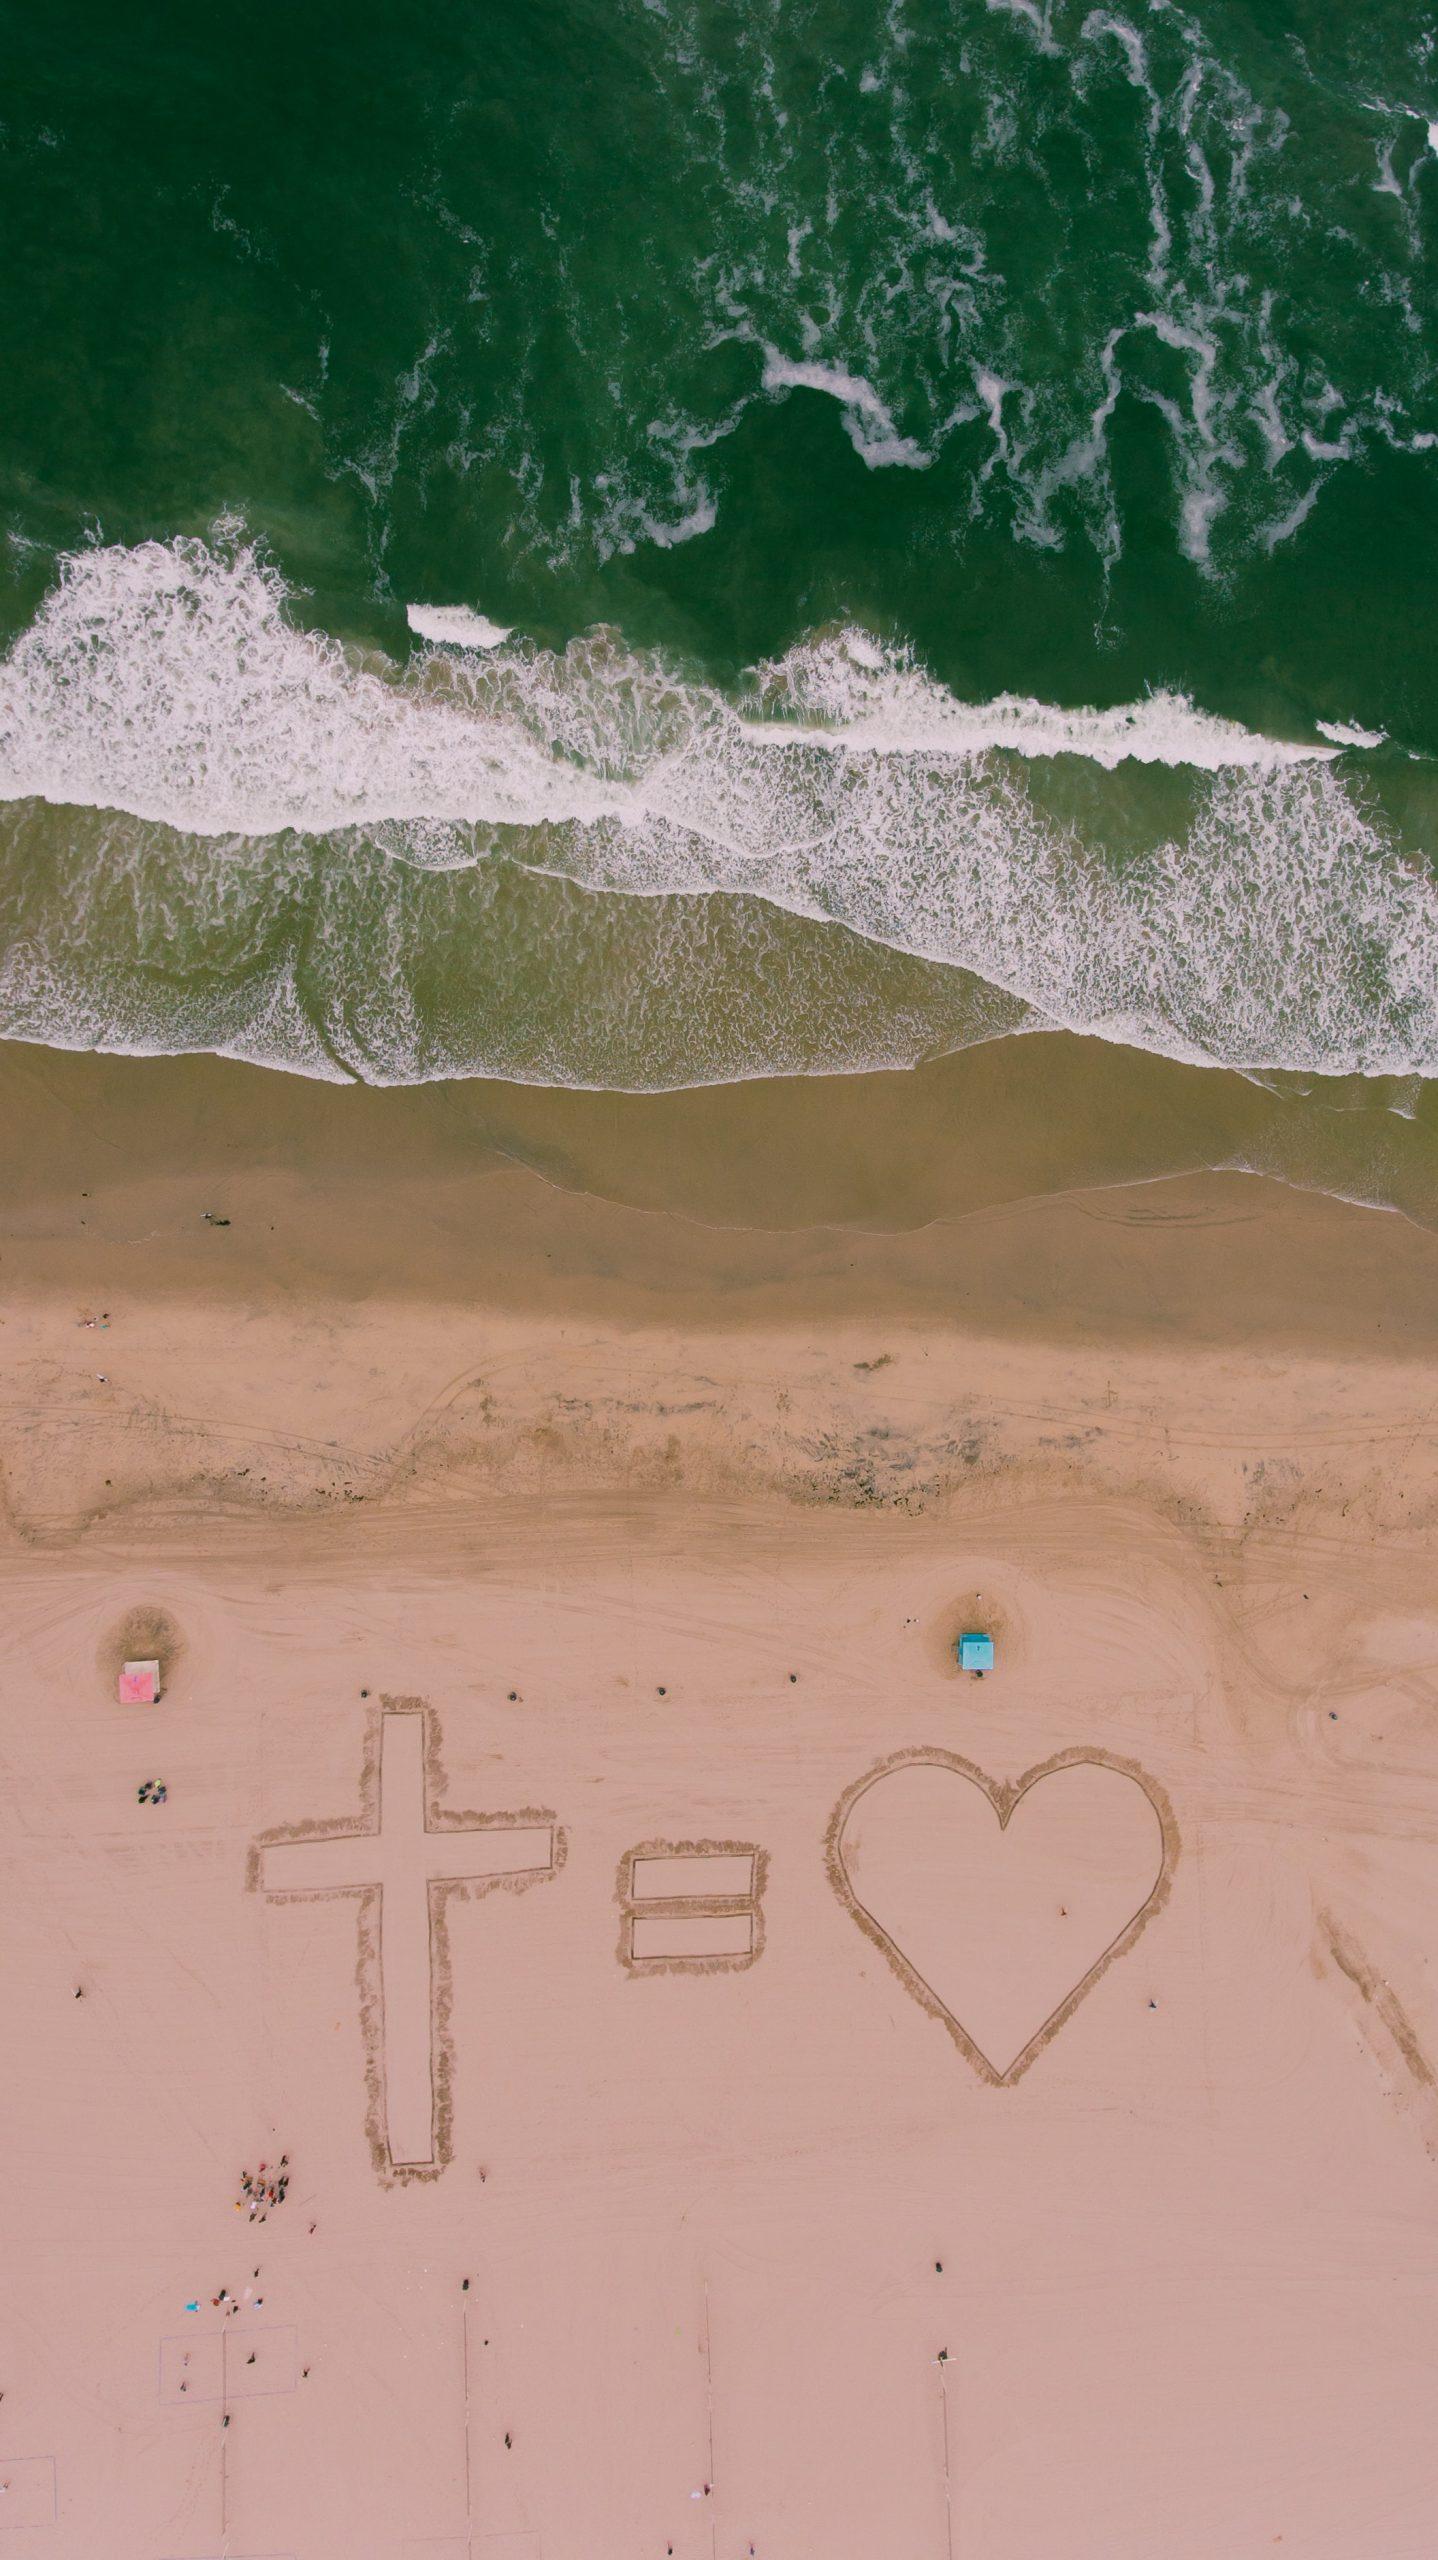 Love and enjoy Jesus